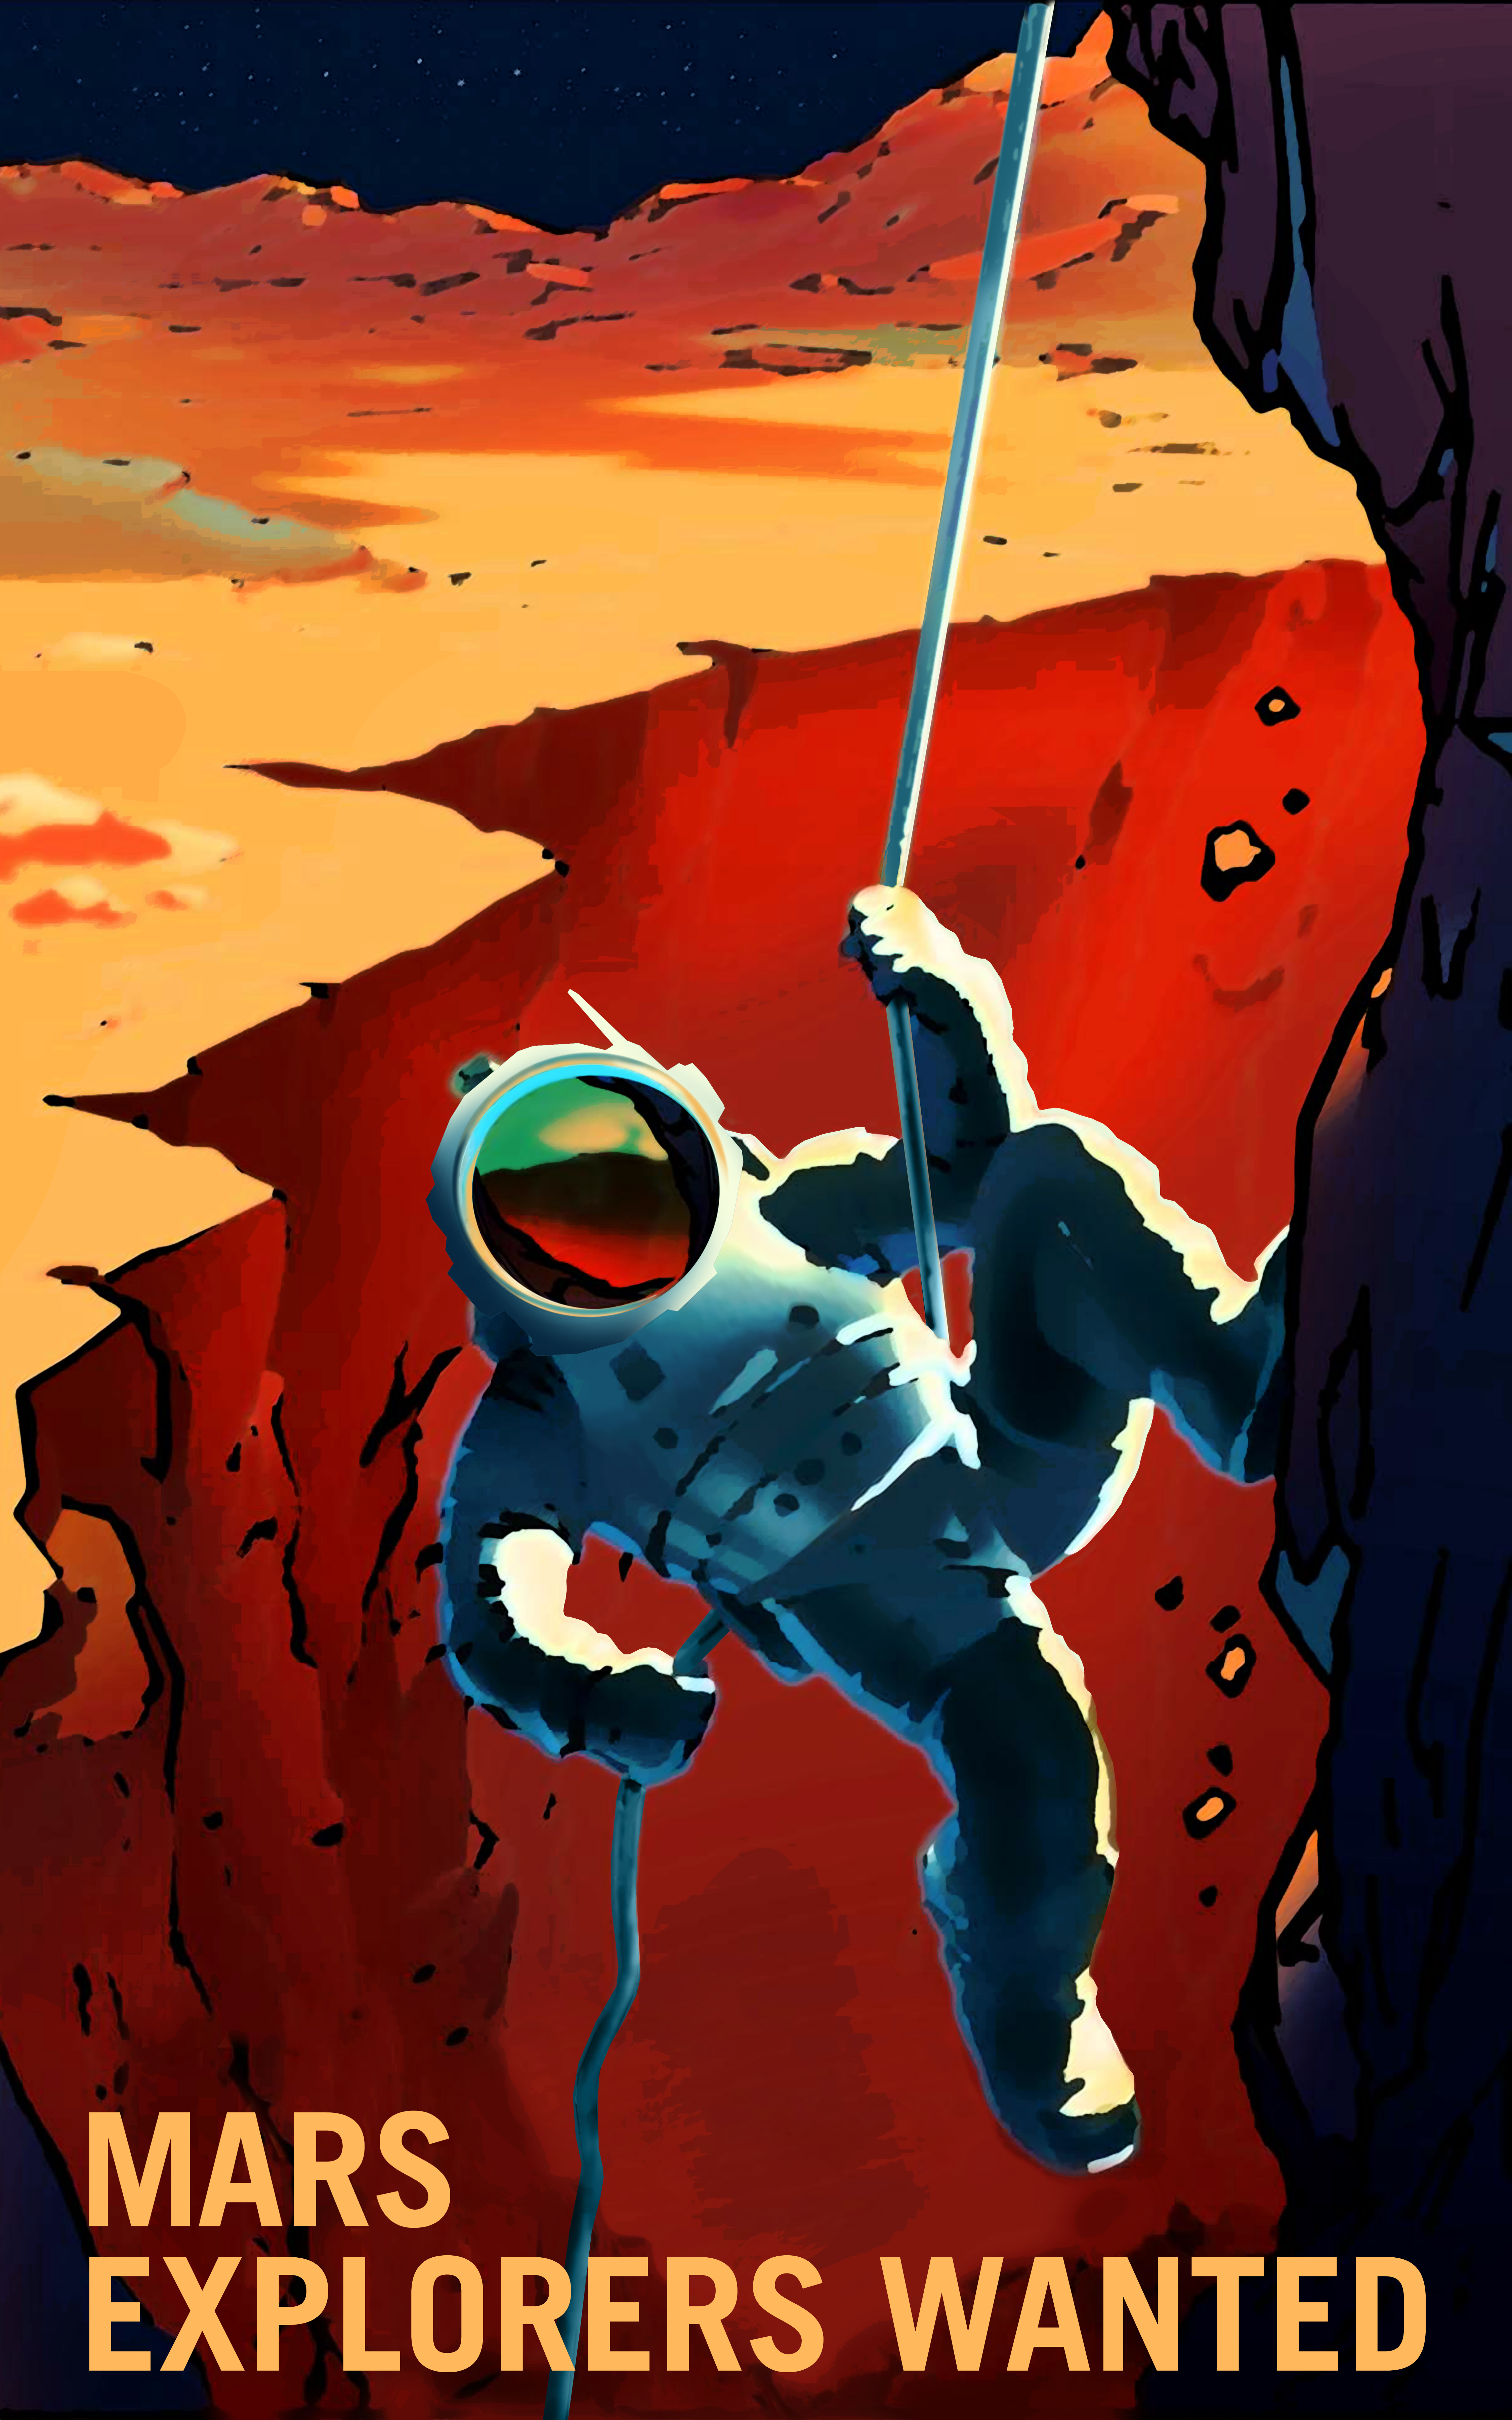 nasa explorer mars - 750×1000